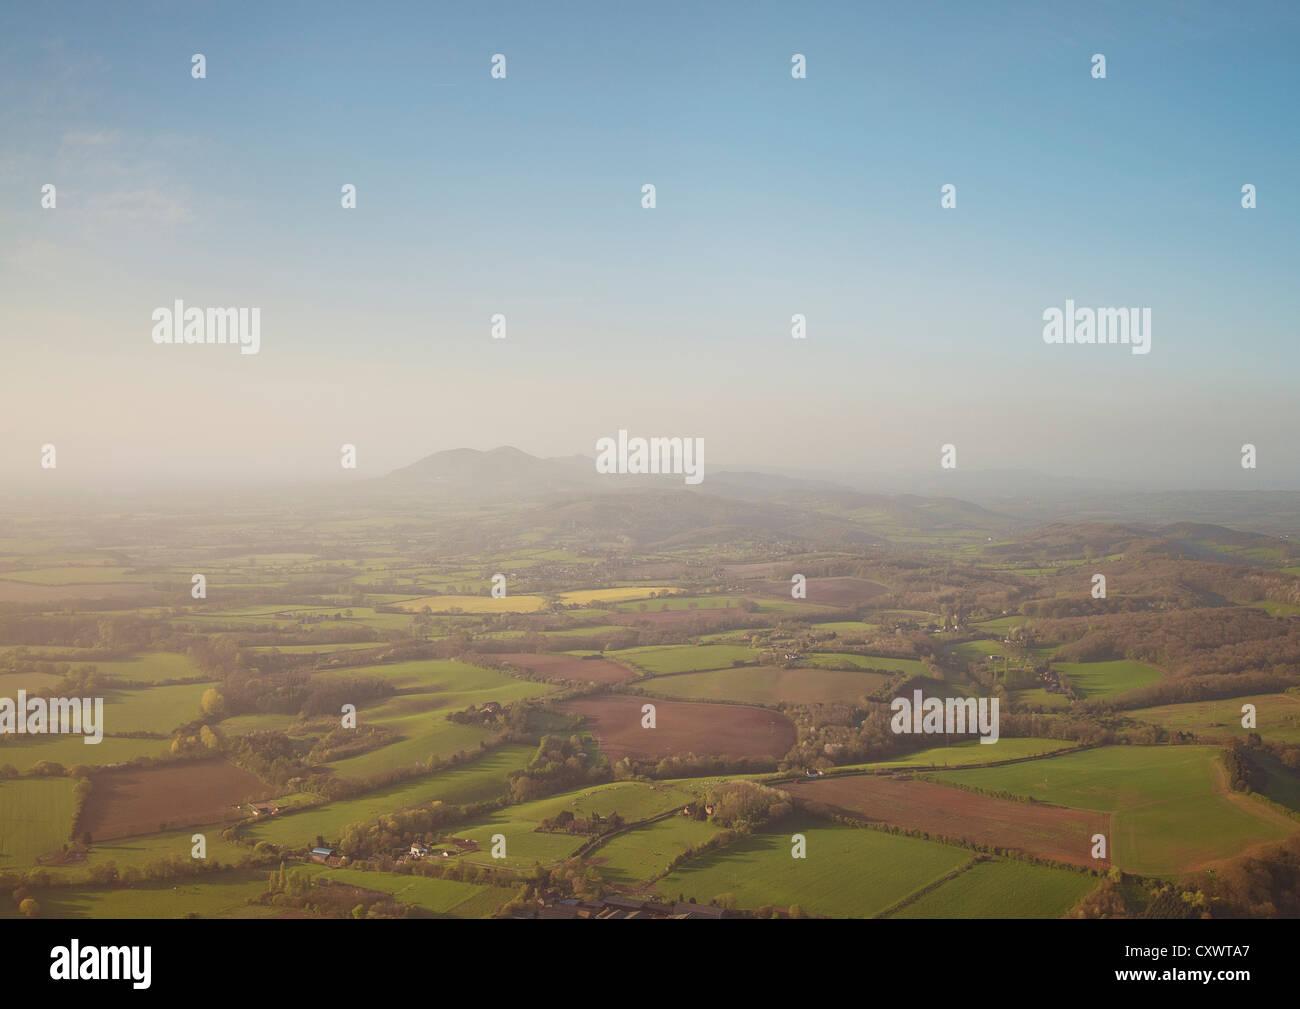 Aerial view of rural farmlands - Stock Image